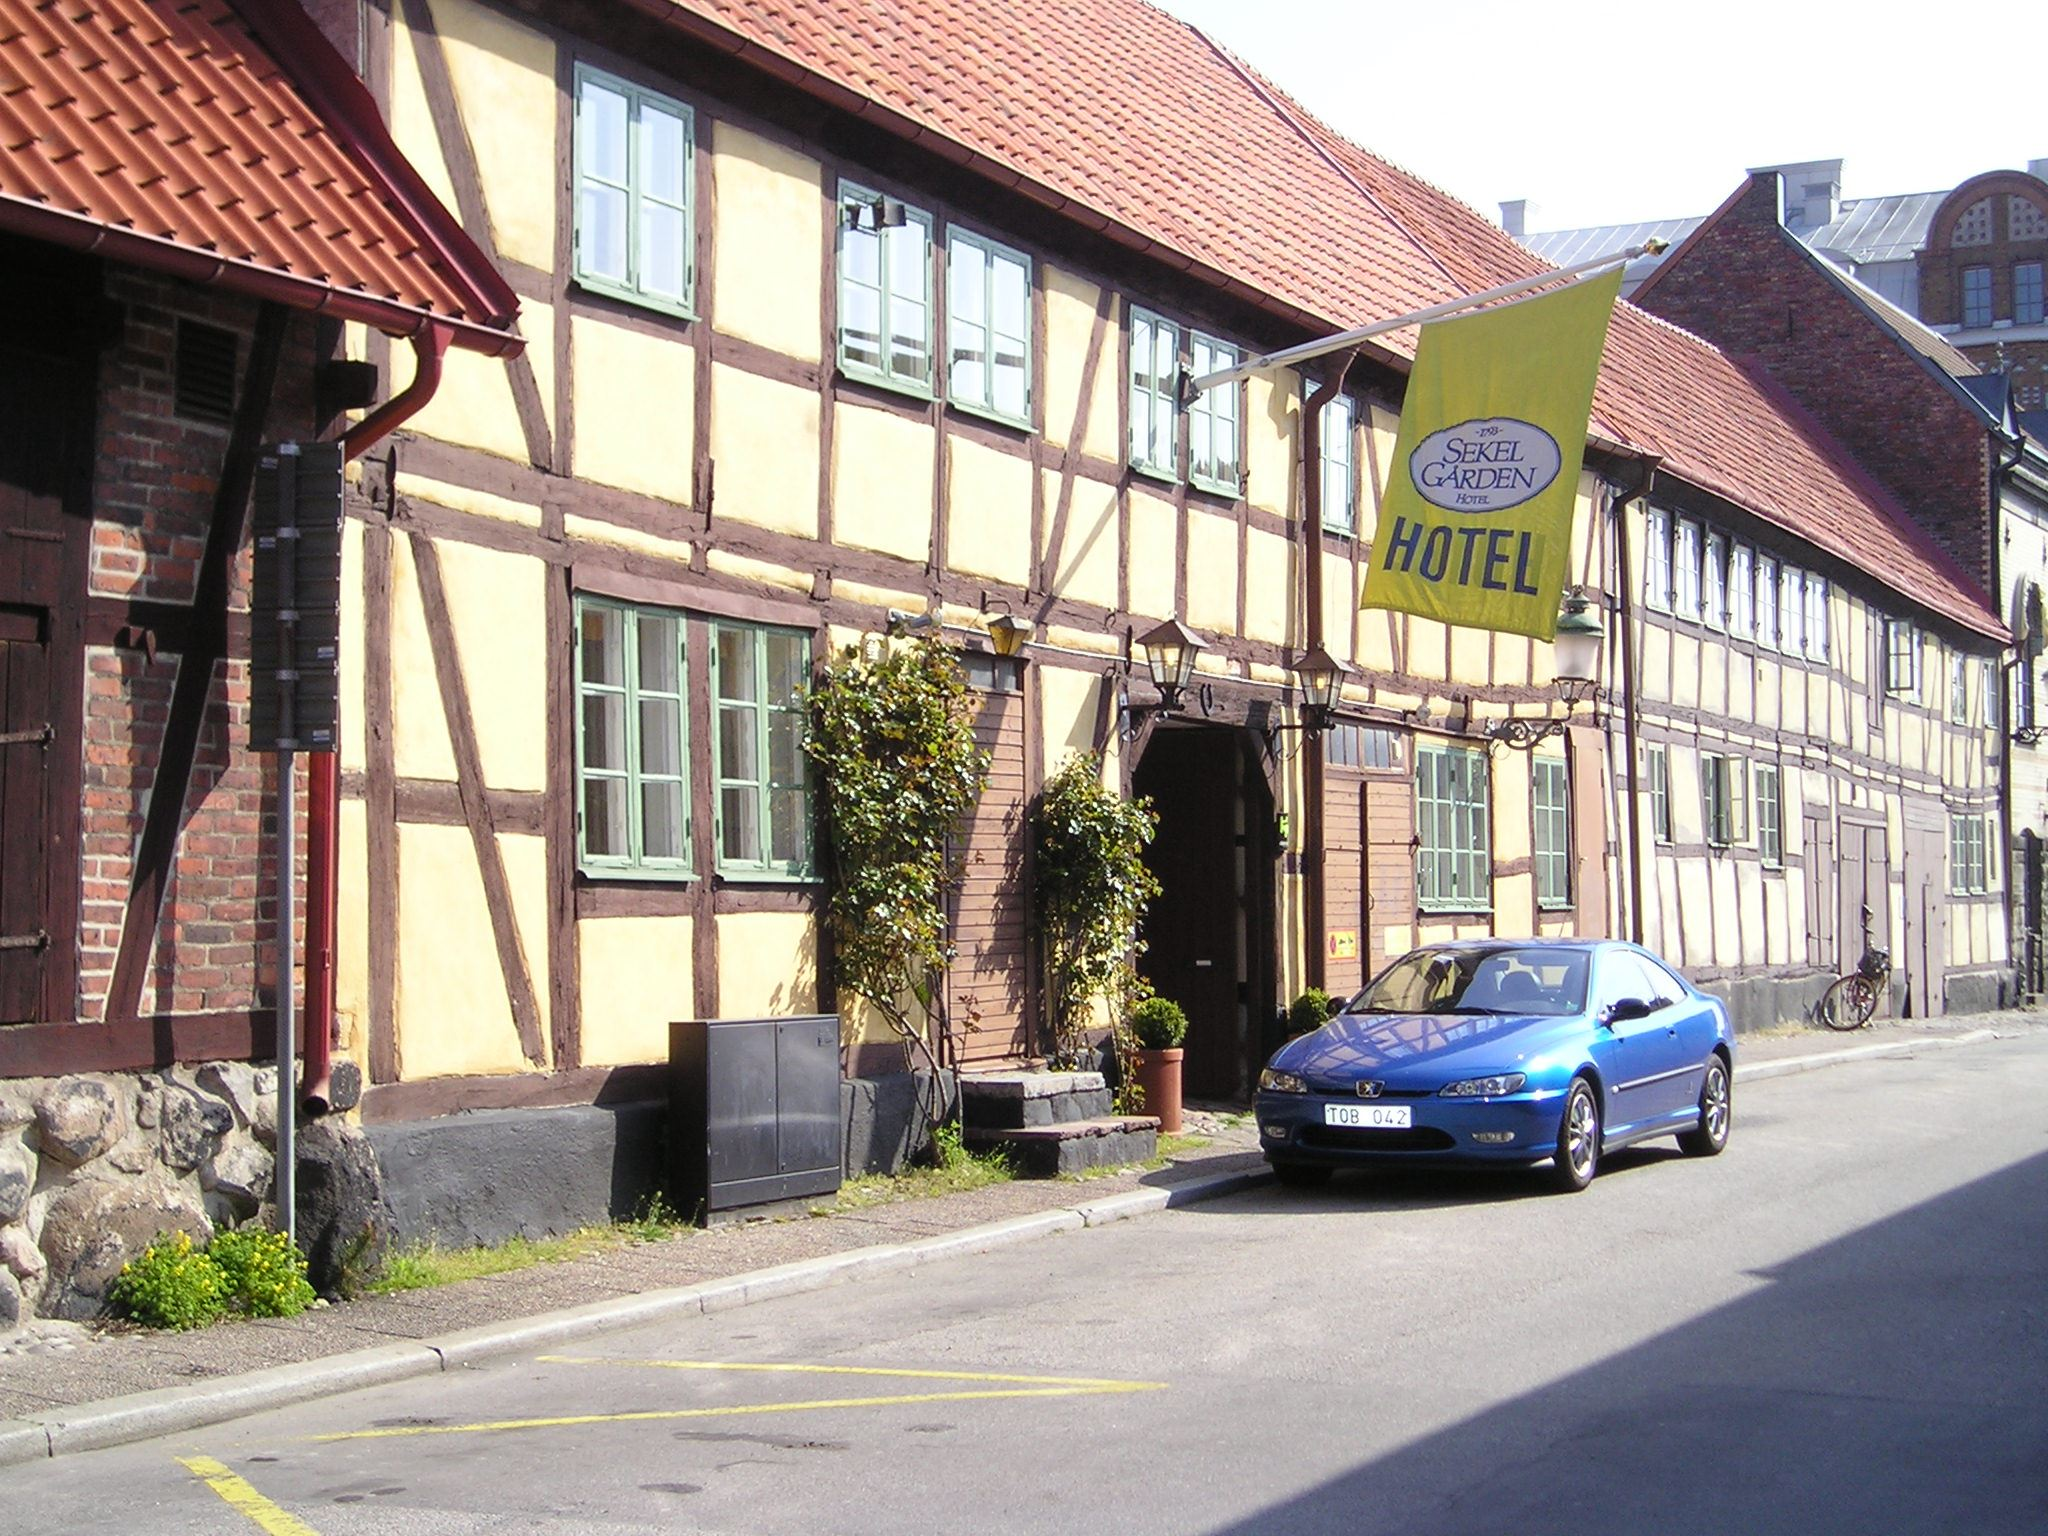 Anno 1793 Sekelgarden Hotel